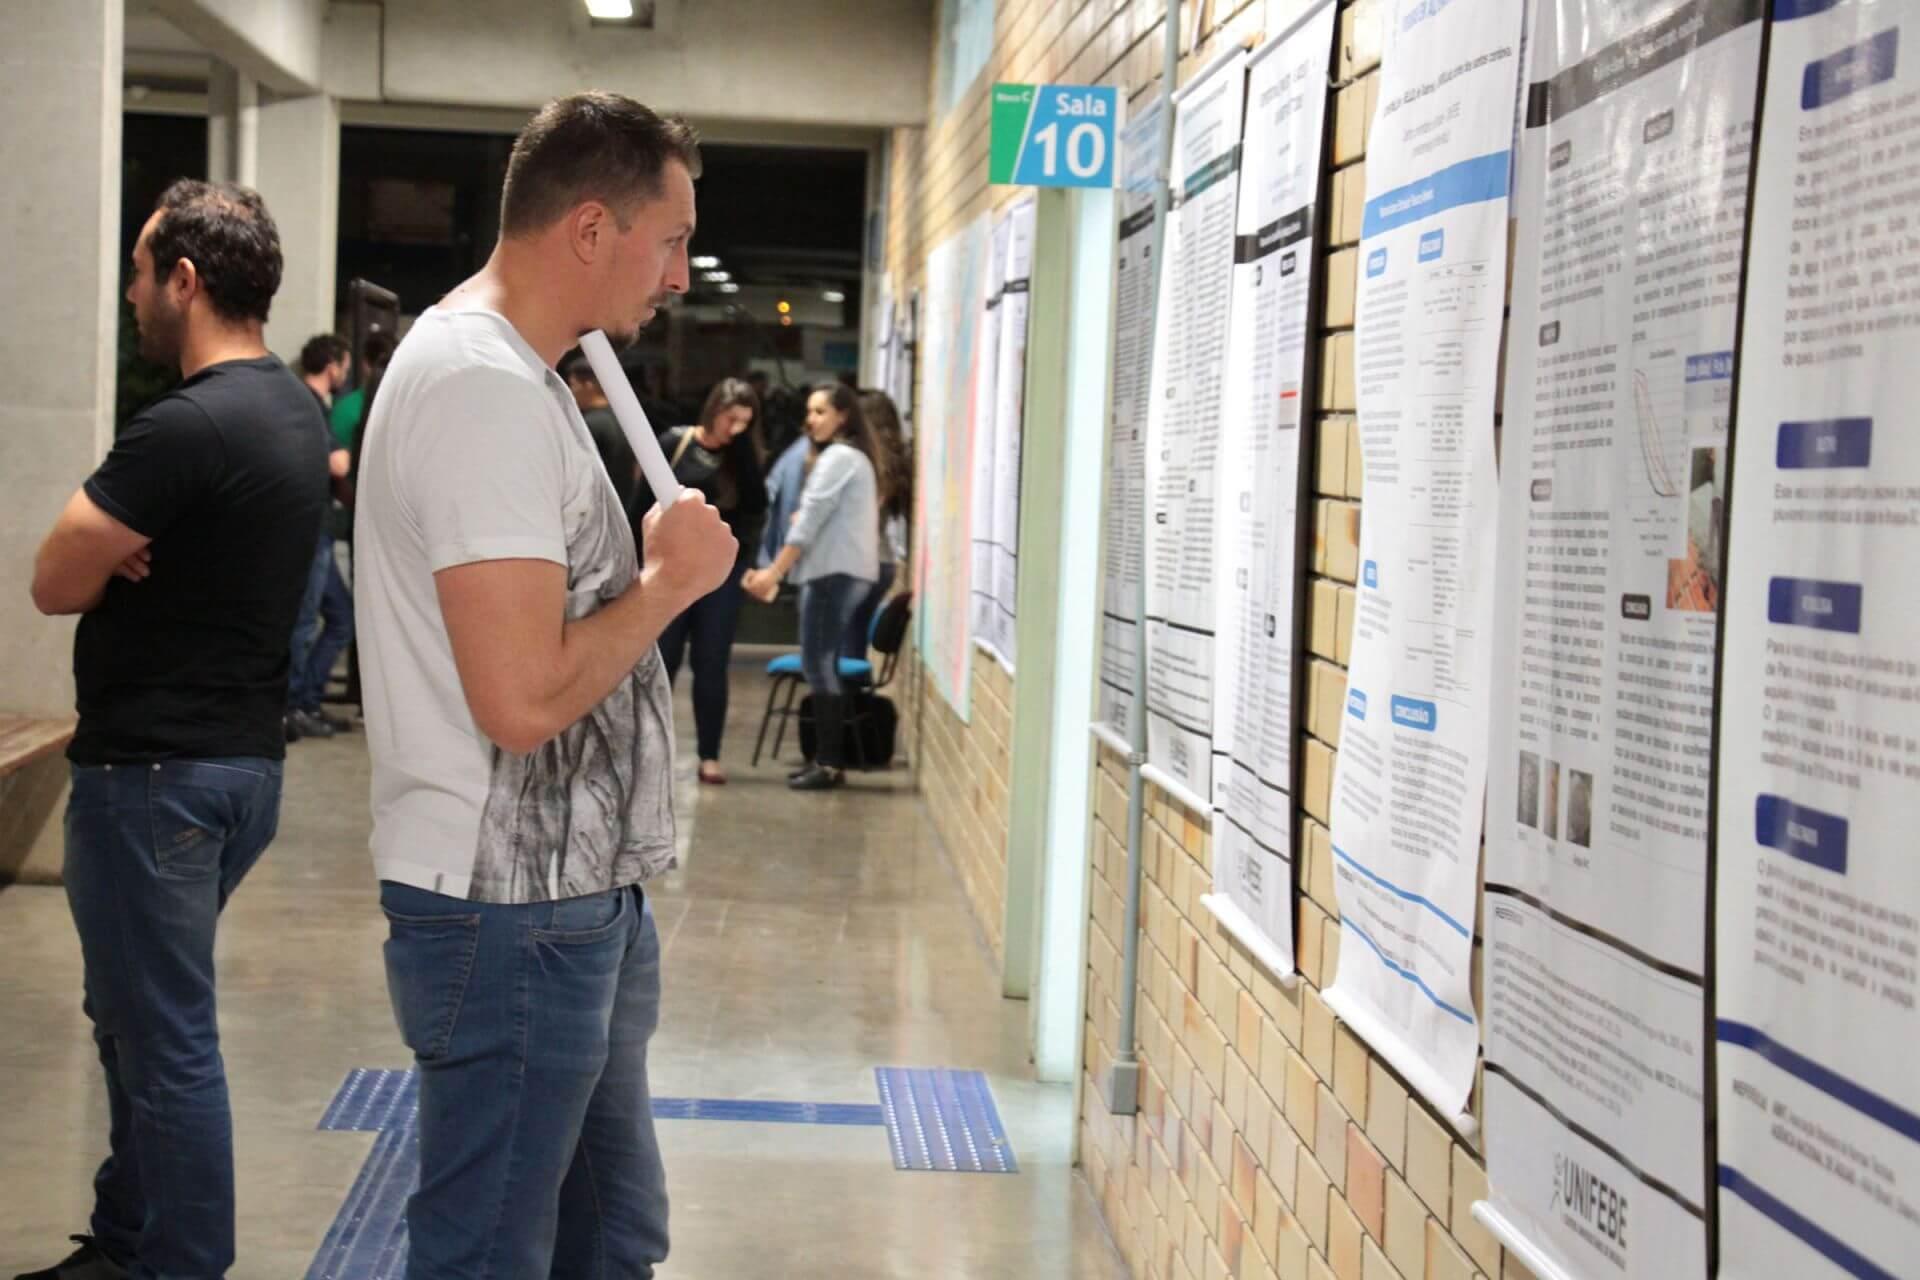 Evento científico debate Desenvolvimento Regional